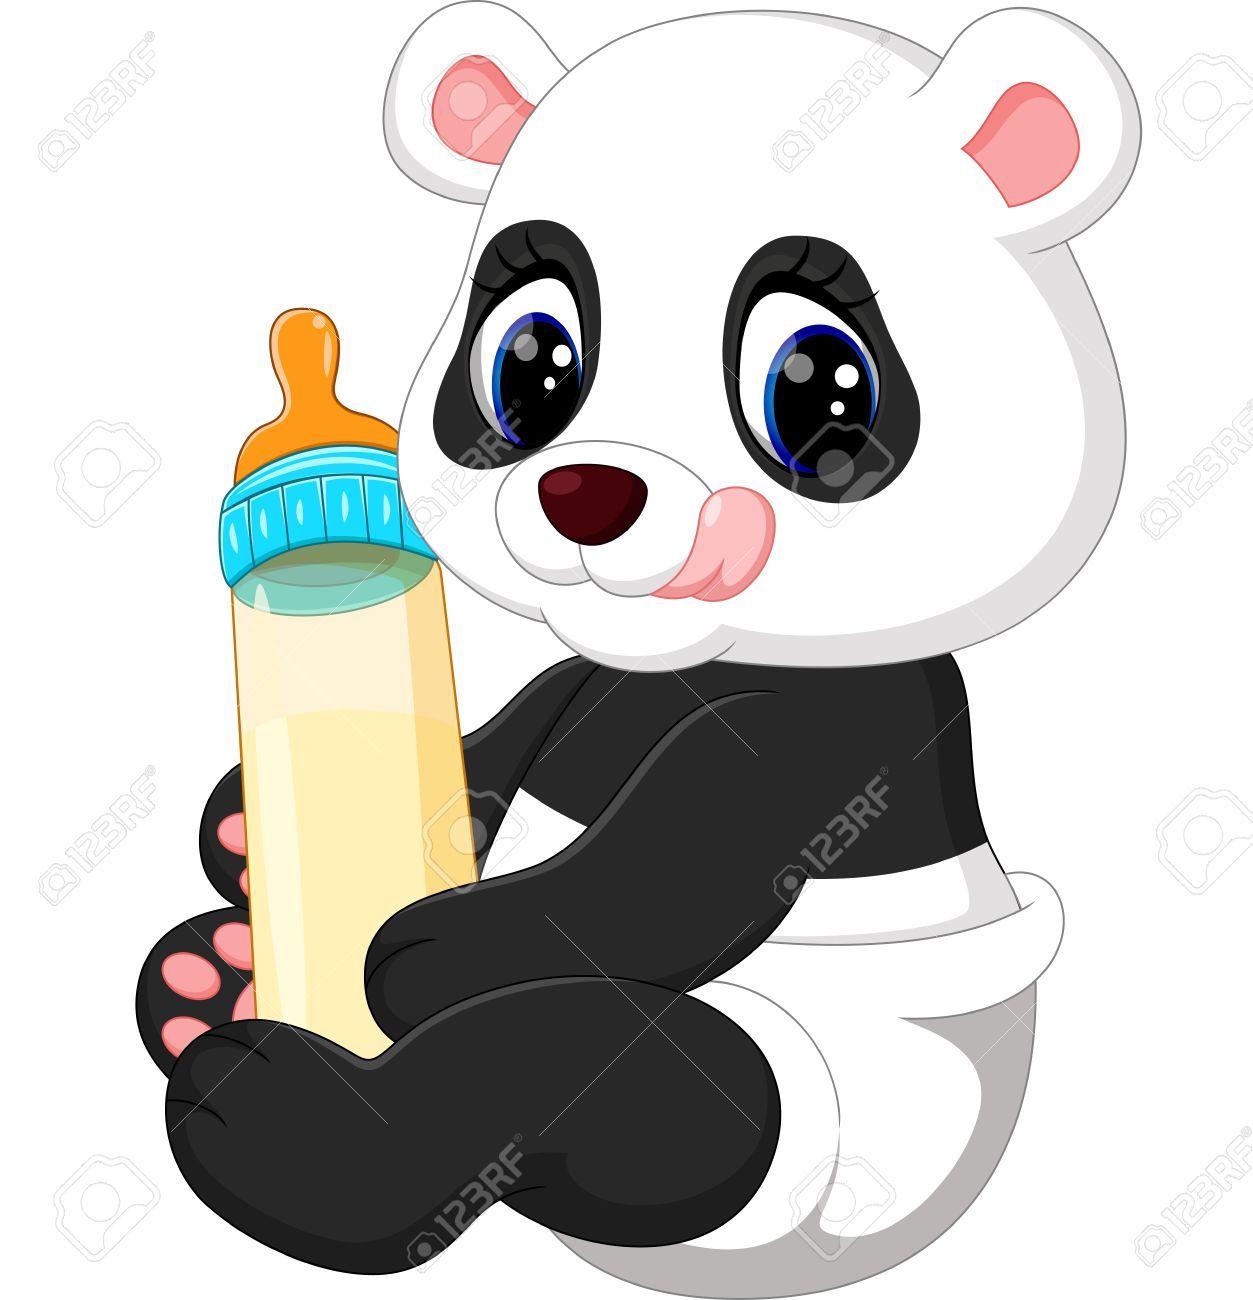 Cute Baby Panda Cartoon Affiliate Baby Cute Cartoon Panda Desenho Animado Bebe Arte De Panda Filhote De Panda